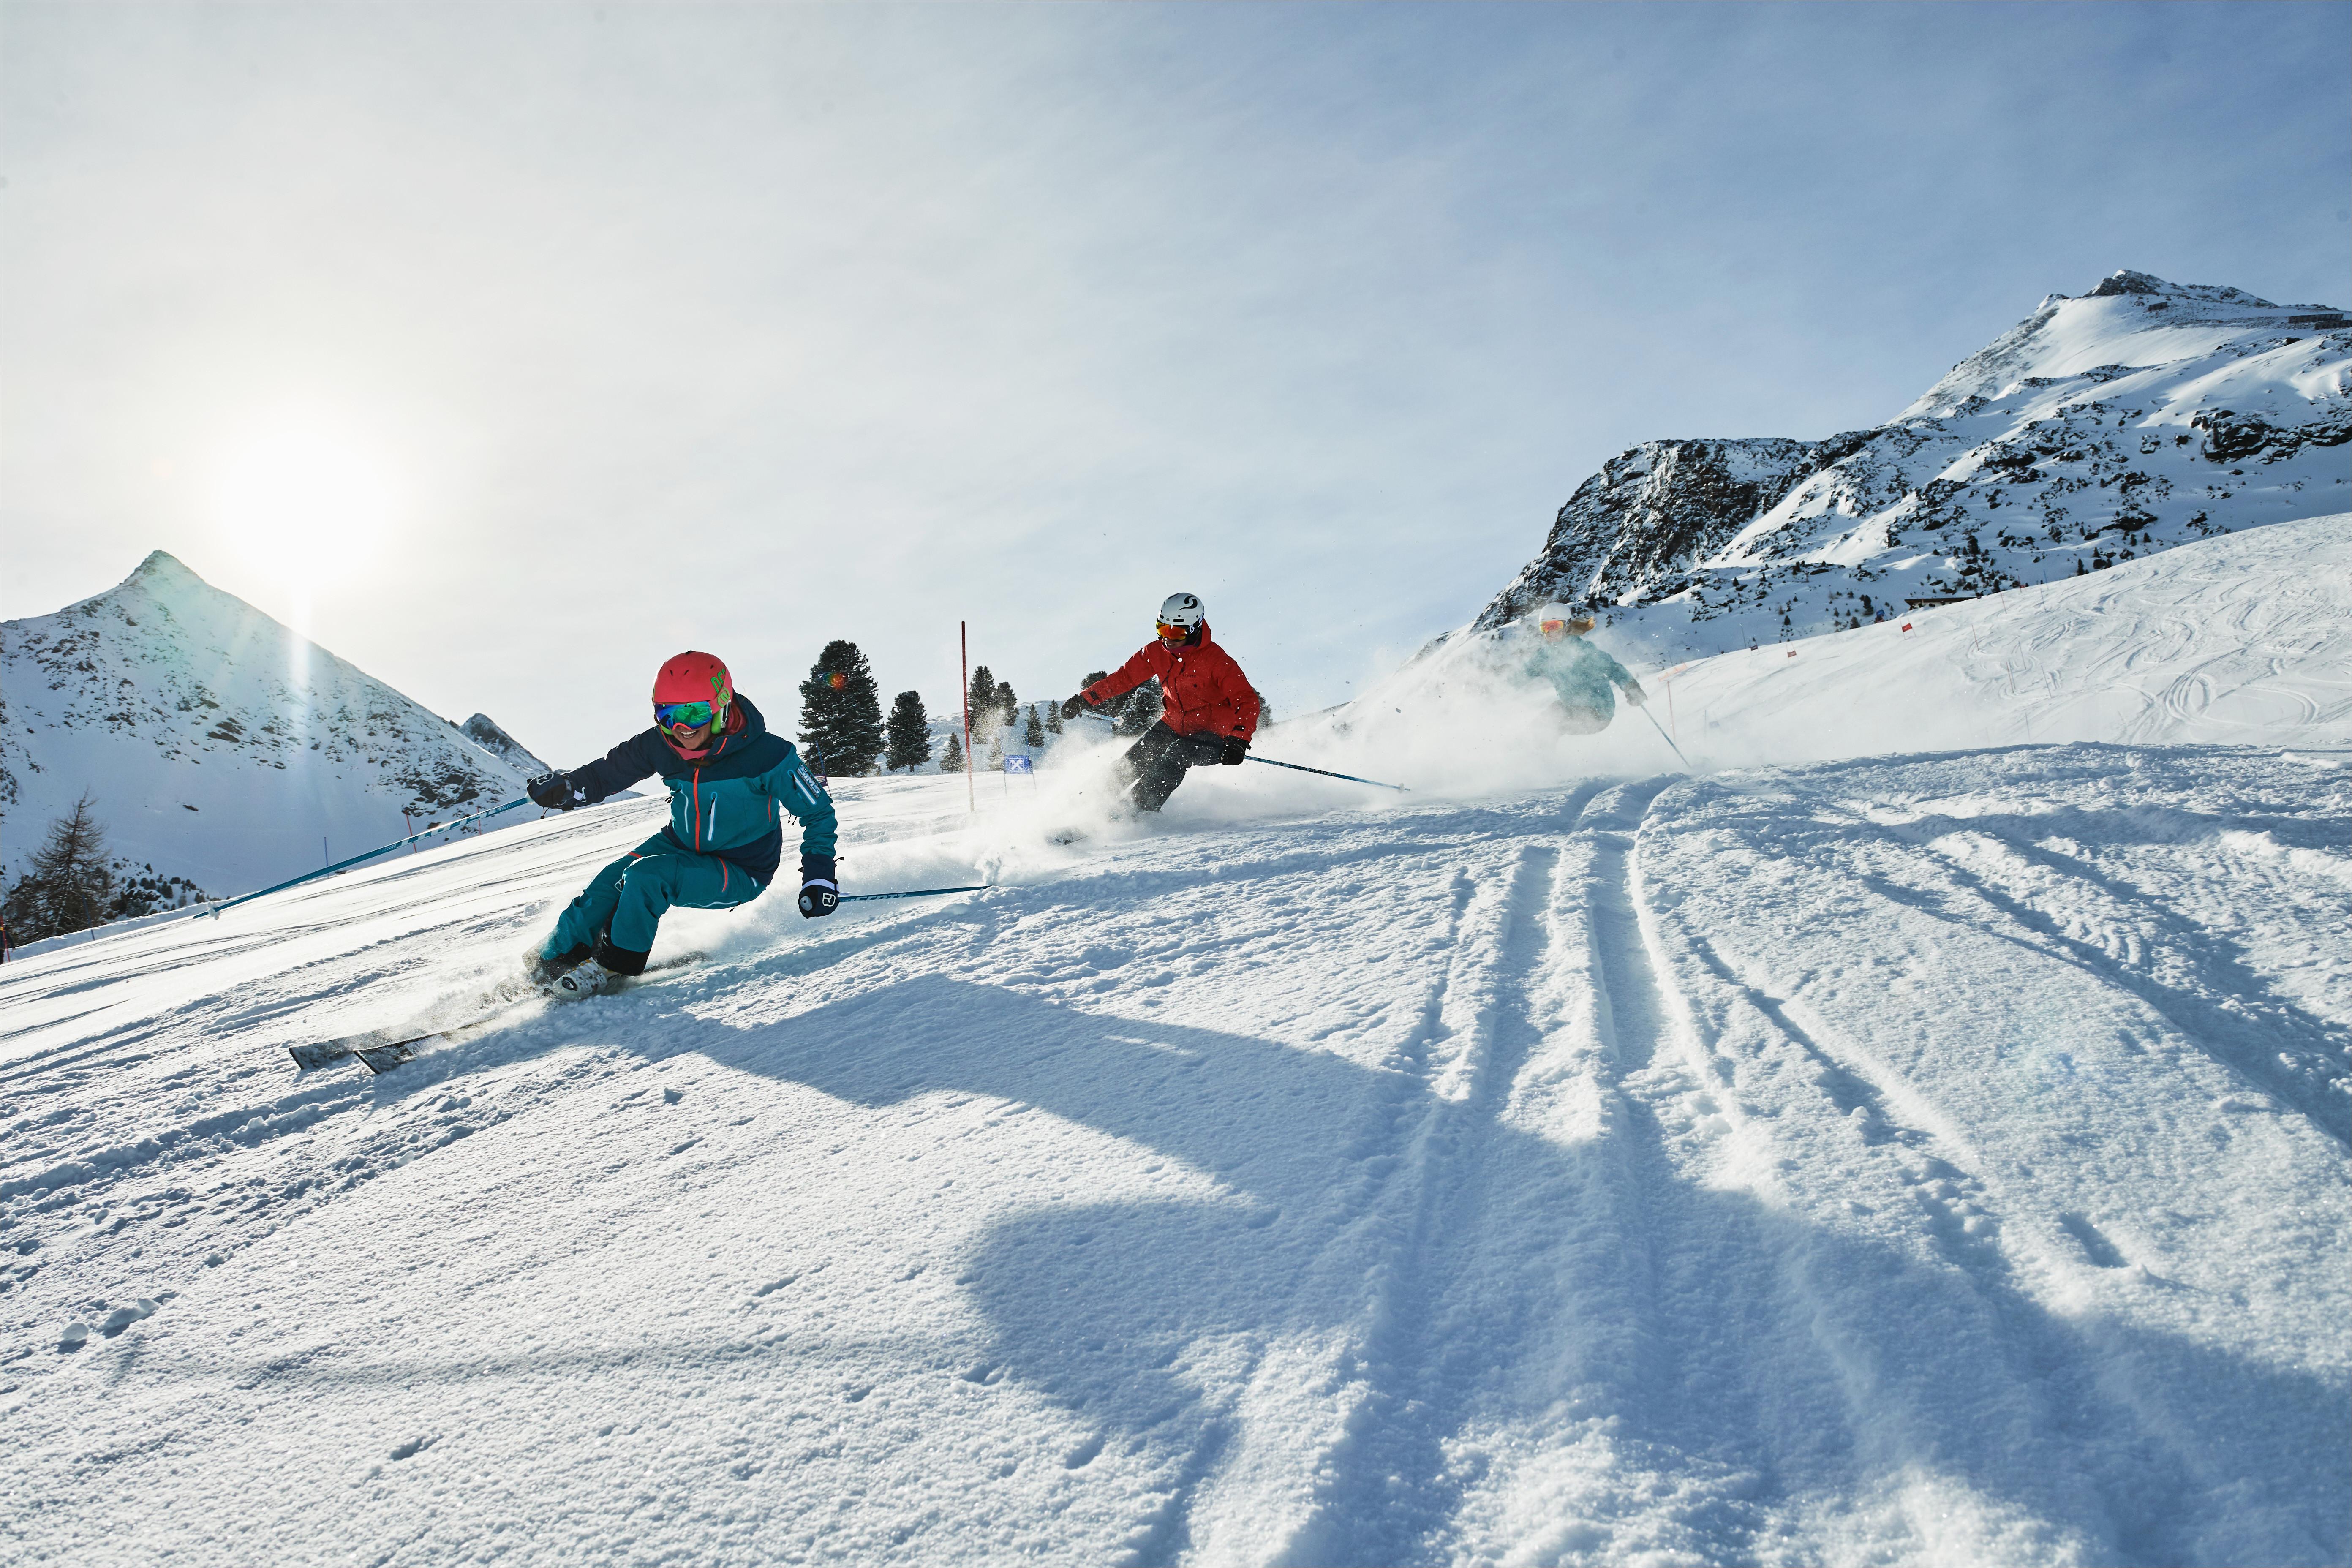 ski resort guides snow forecast ski holiday discounts ski club